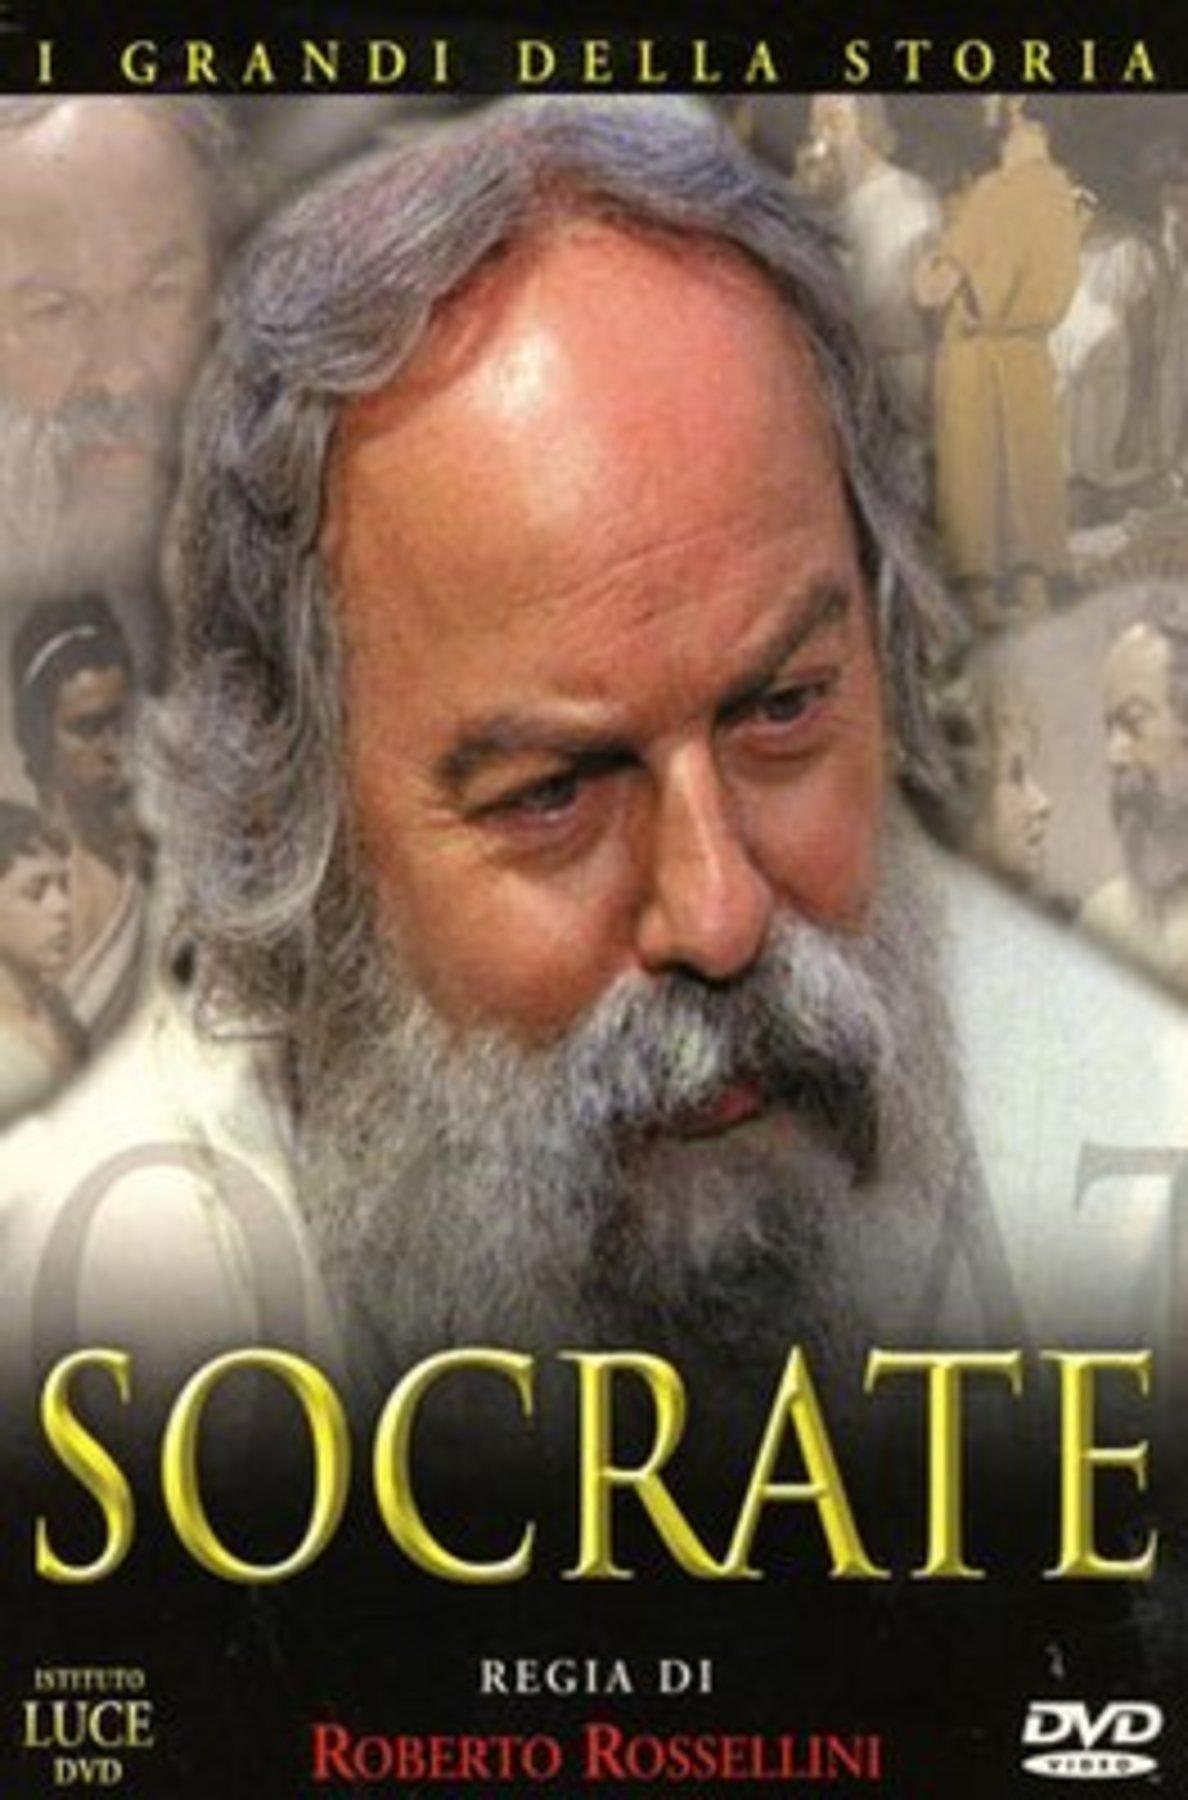 1971 SOCRATES BAIXAR FILME